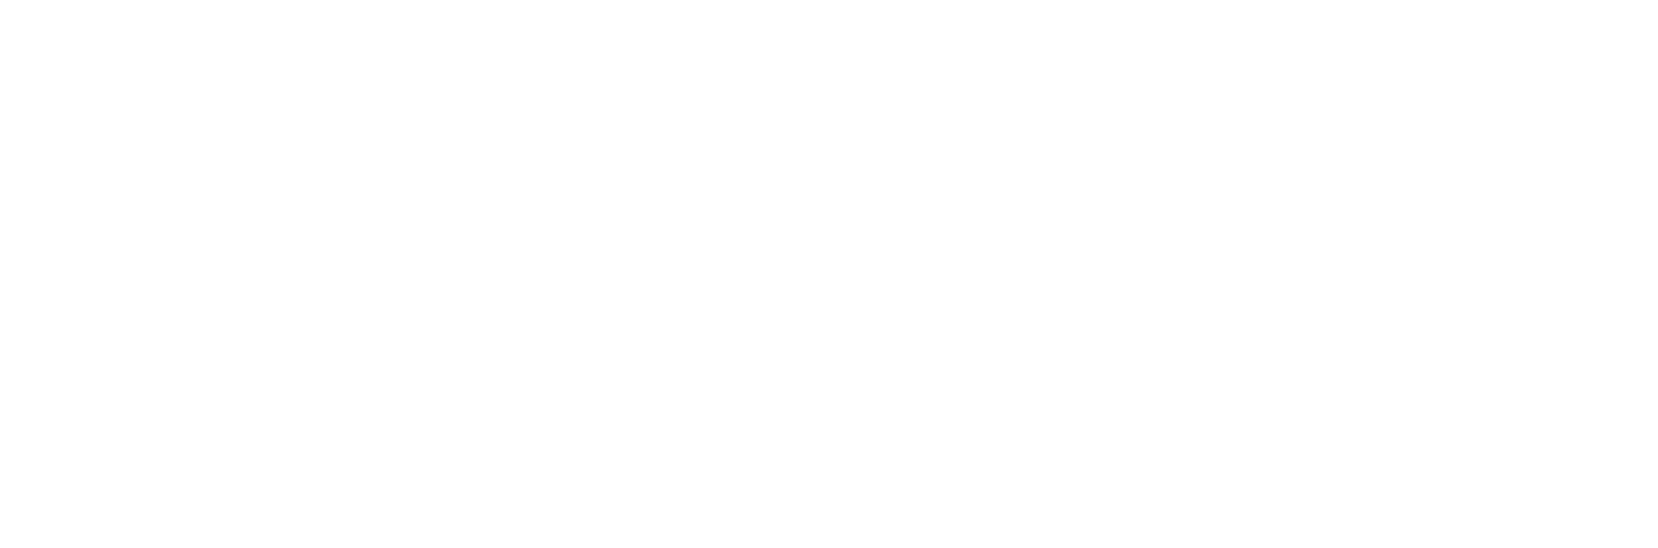 Meravi BPO